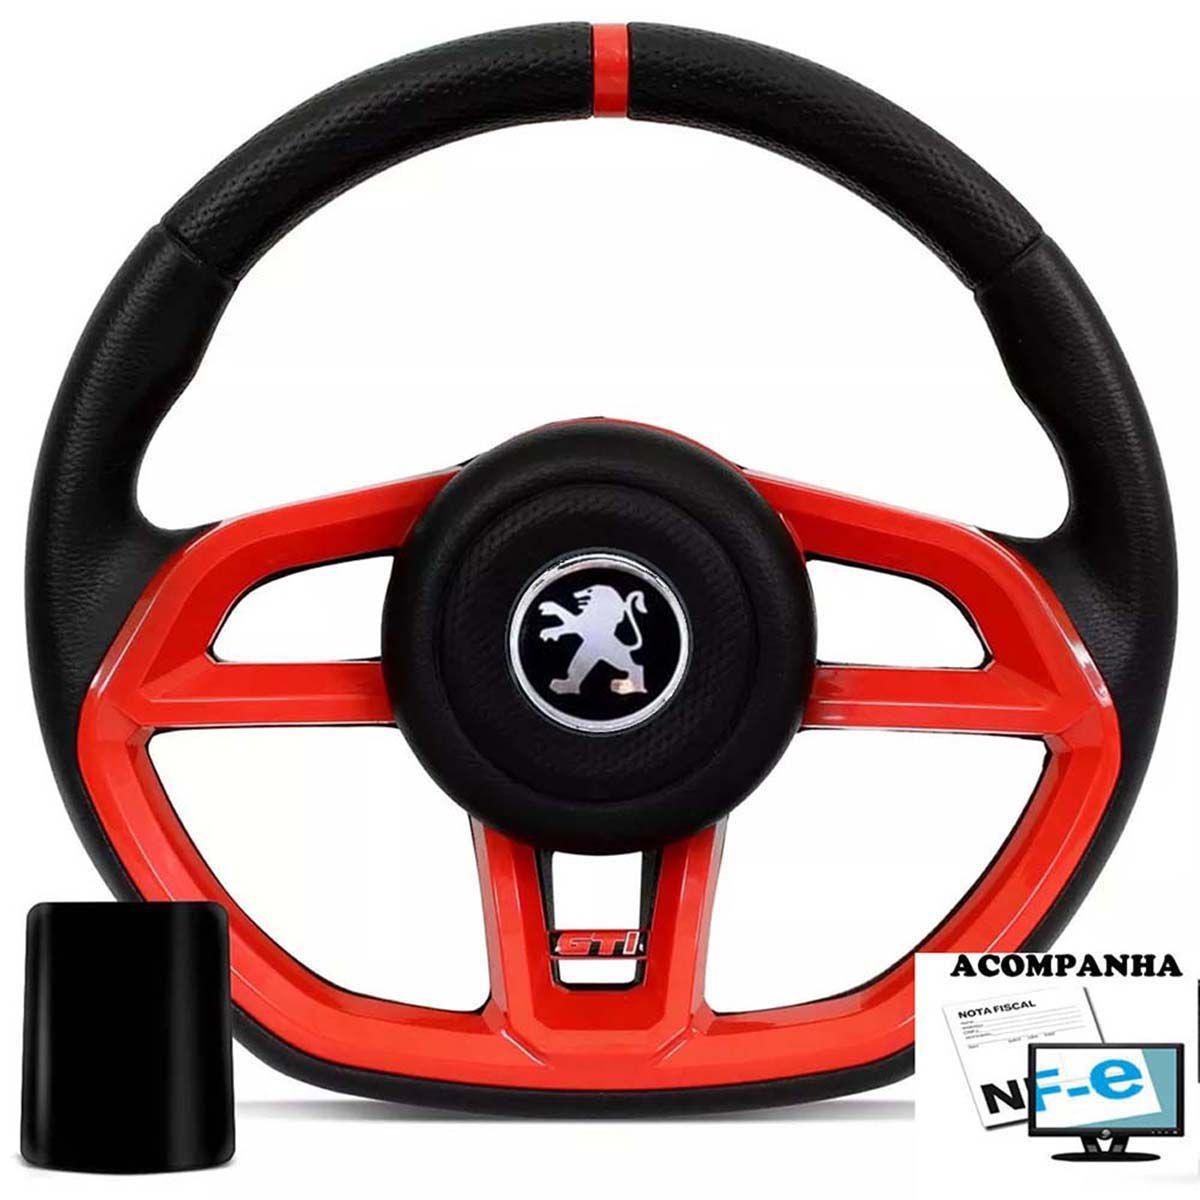 Volante Esportivo Gti Super Surf Peugeot 106 206 207 306 Sw Tampa Acionador de Buzina + Cubo